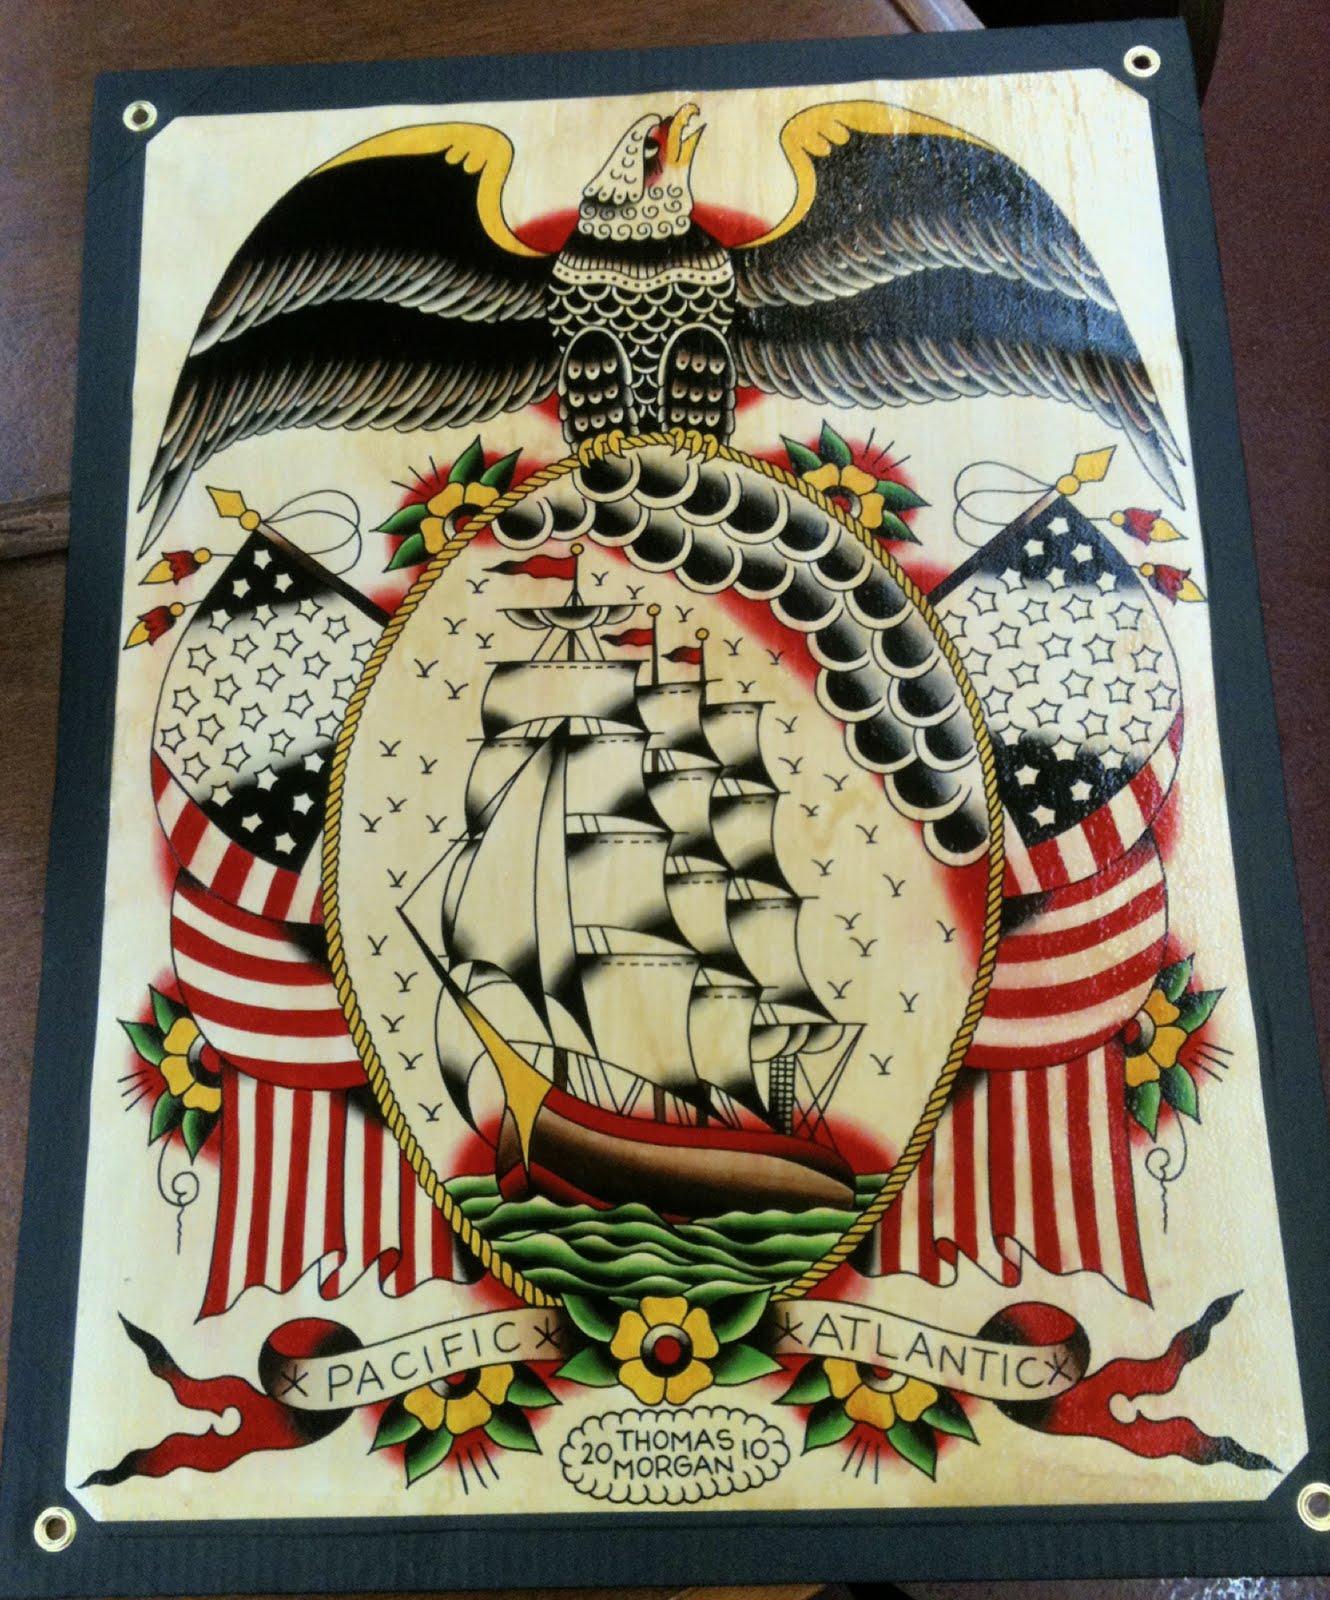 Xtimemachinex The Traditional American Folk Art